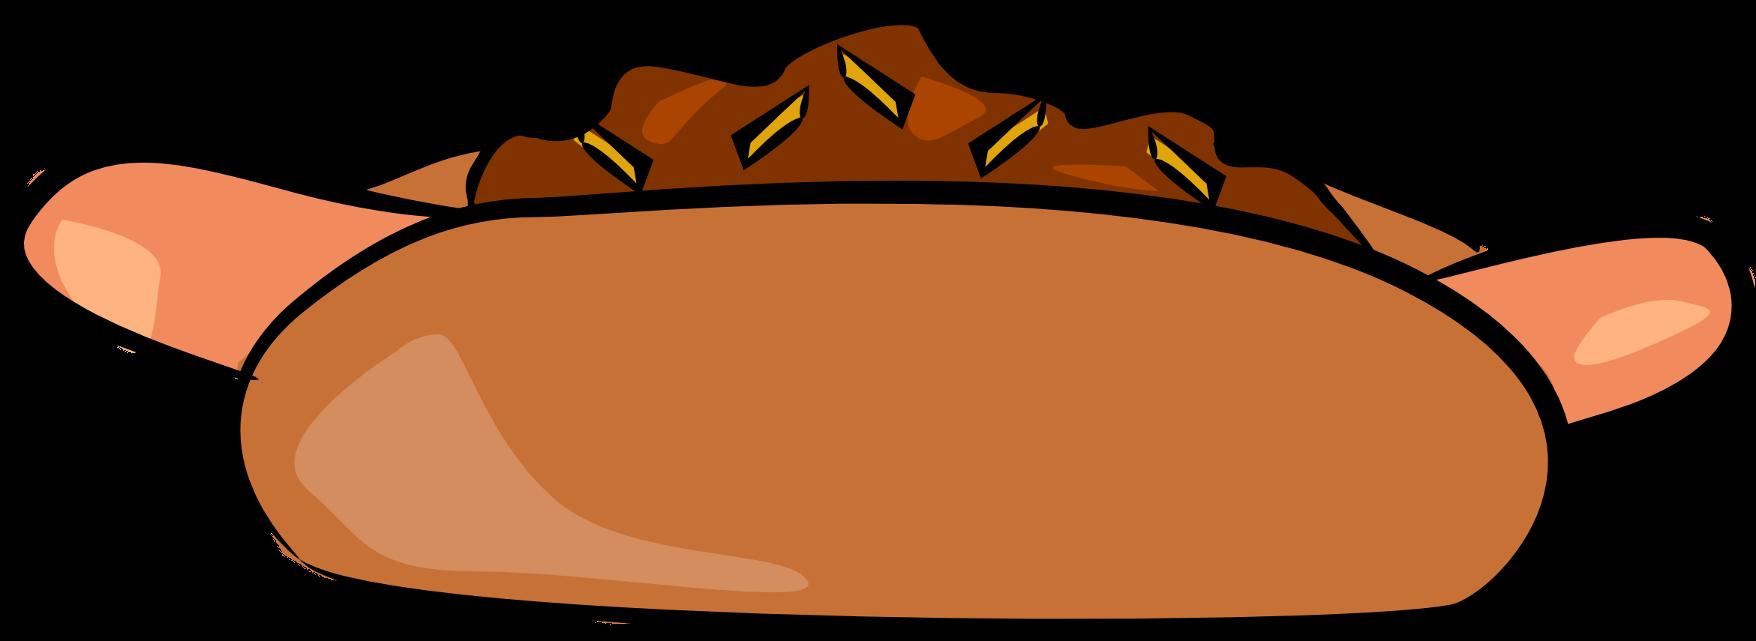 1756x641 Pot Of Chili Clipart